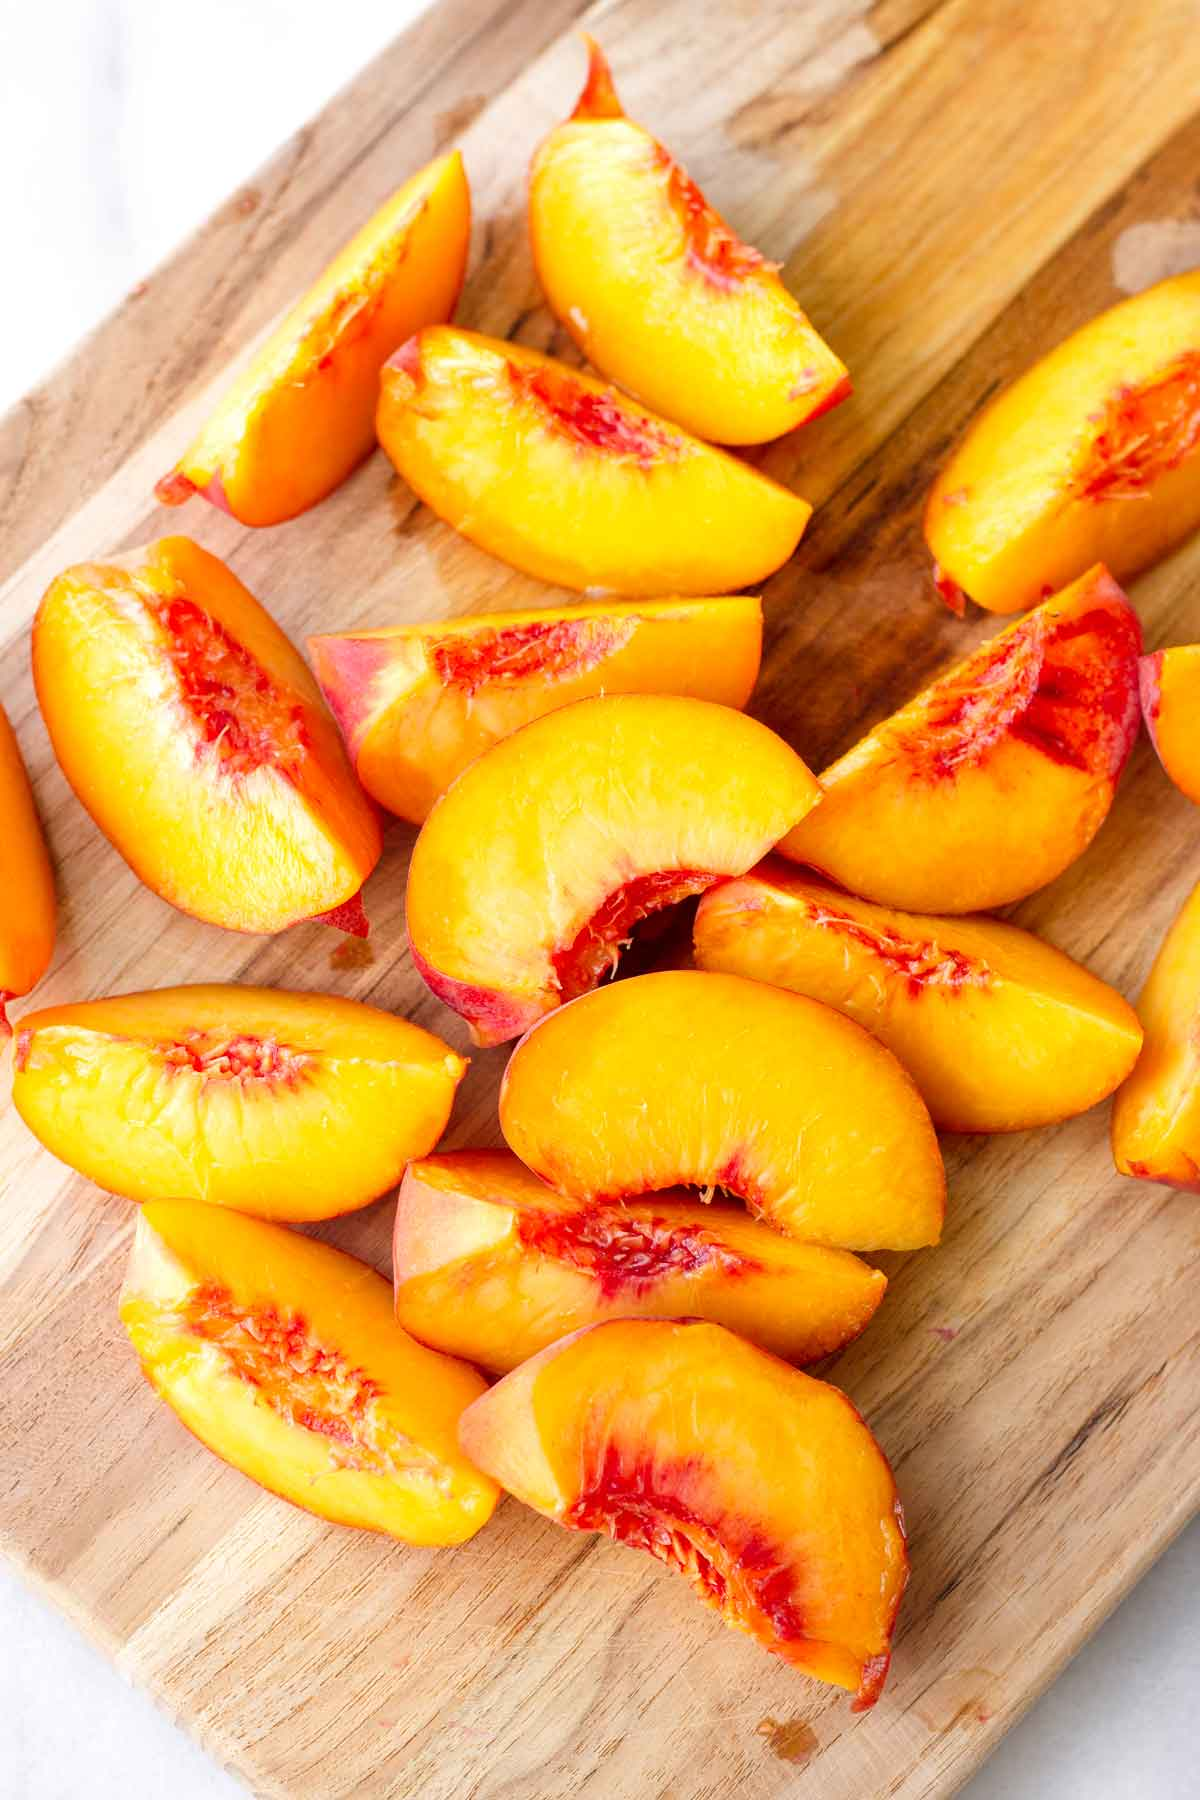 several fresh peach slices on a cutting board